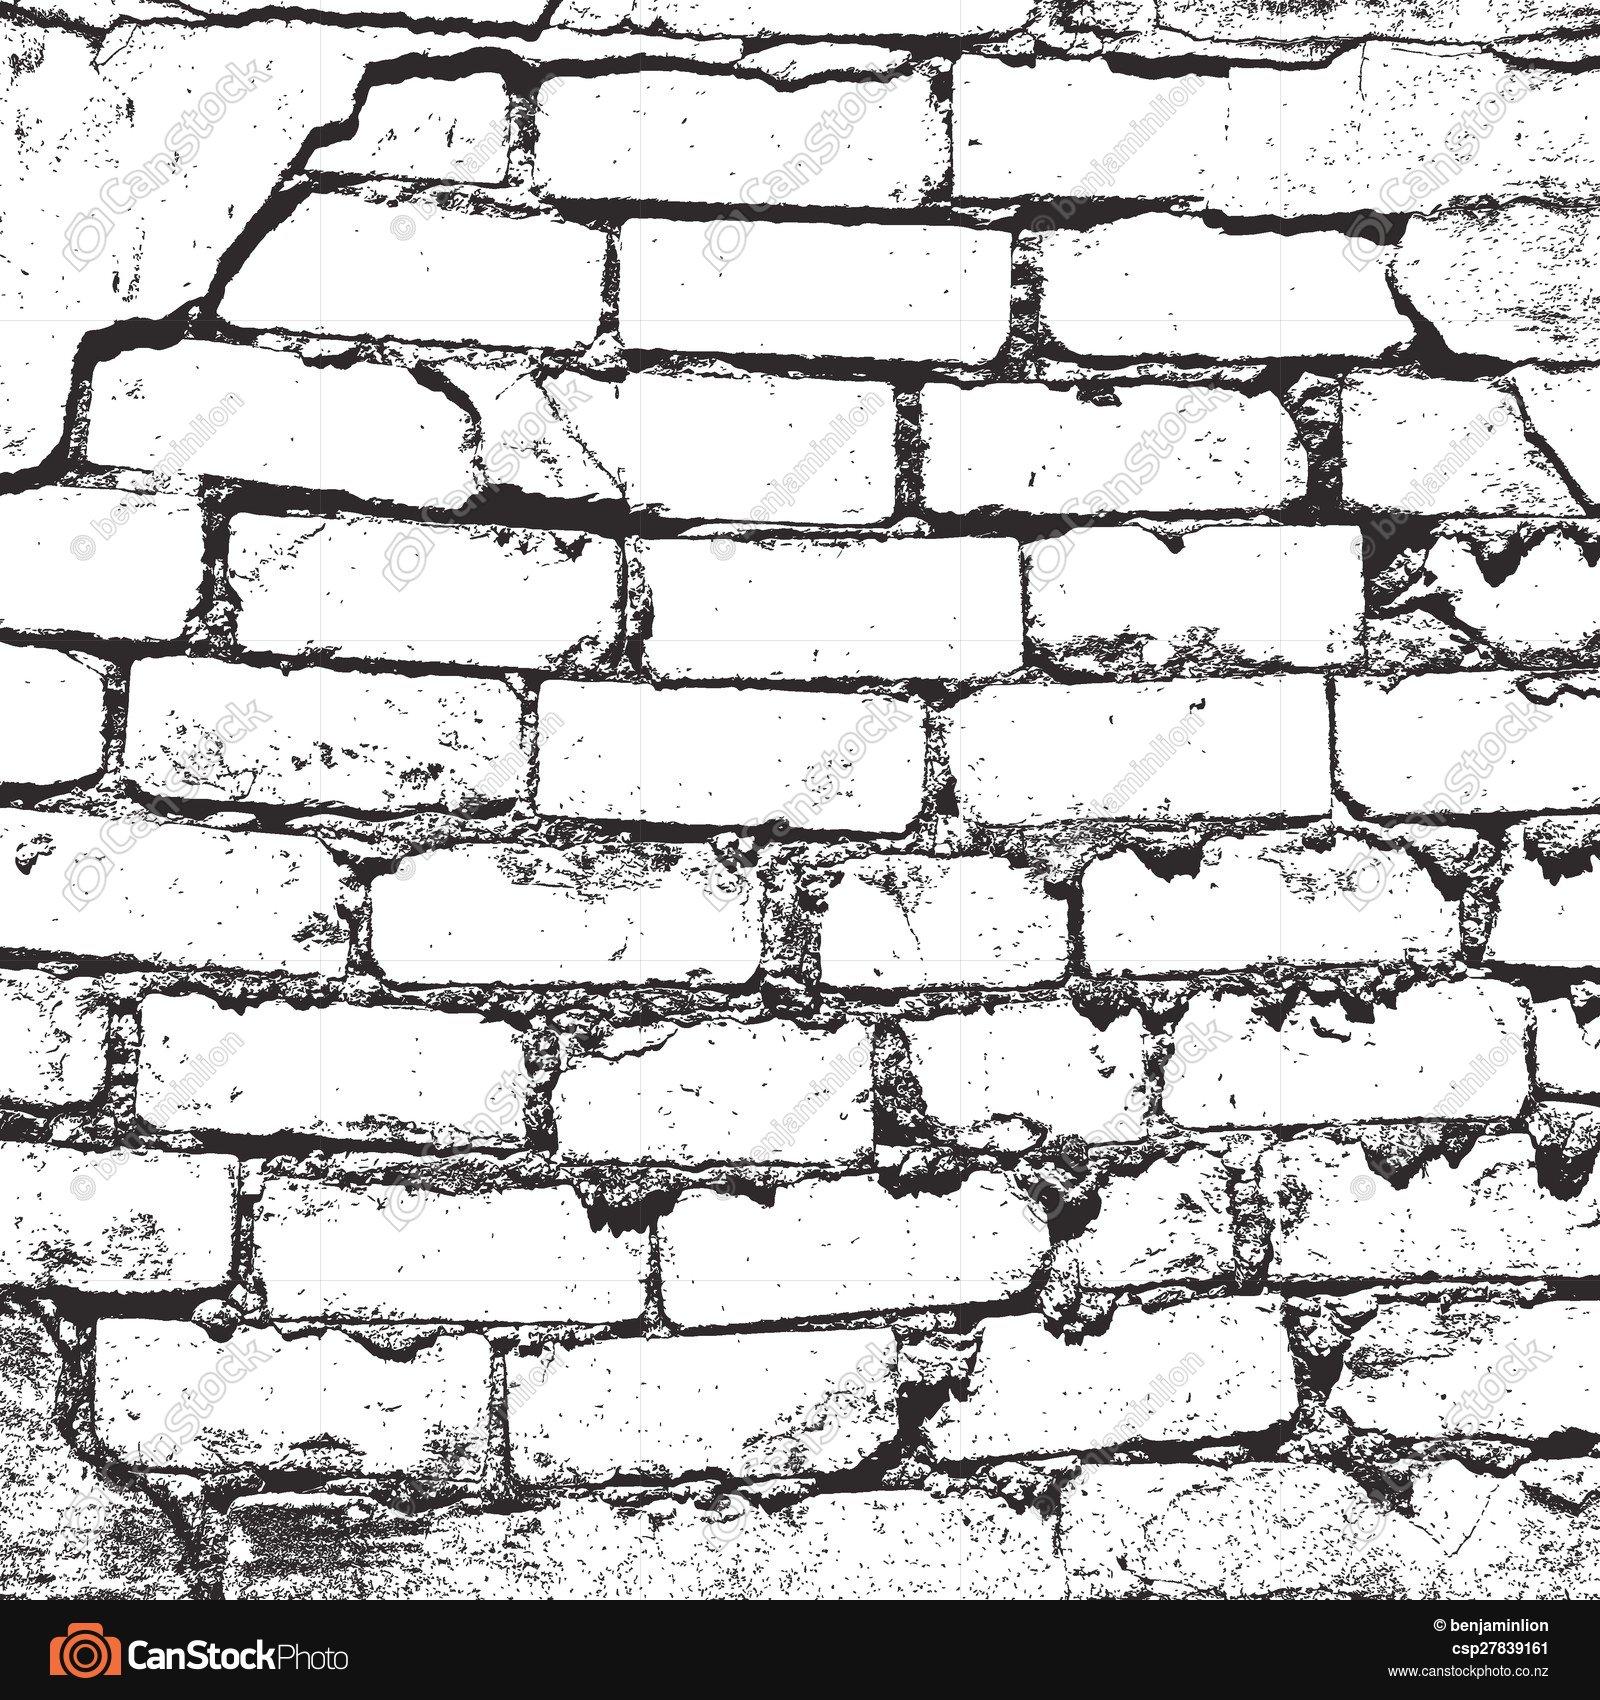 1600x1700 Bricks Damaged. Brick Wall Overlay Texture